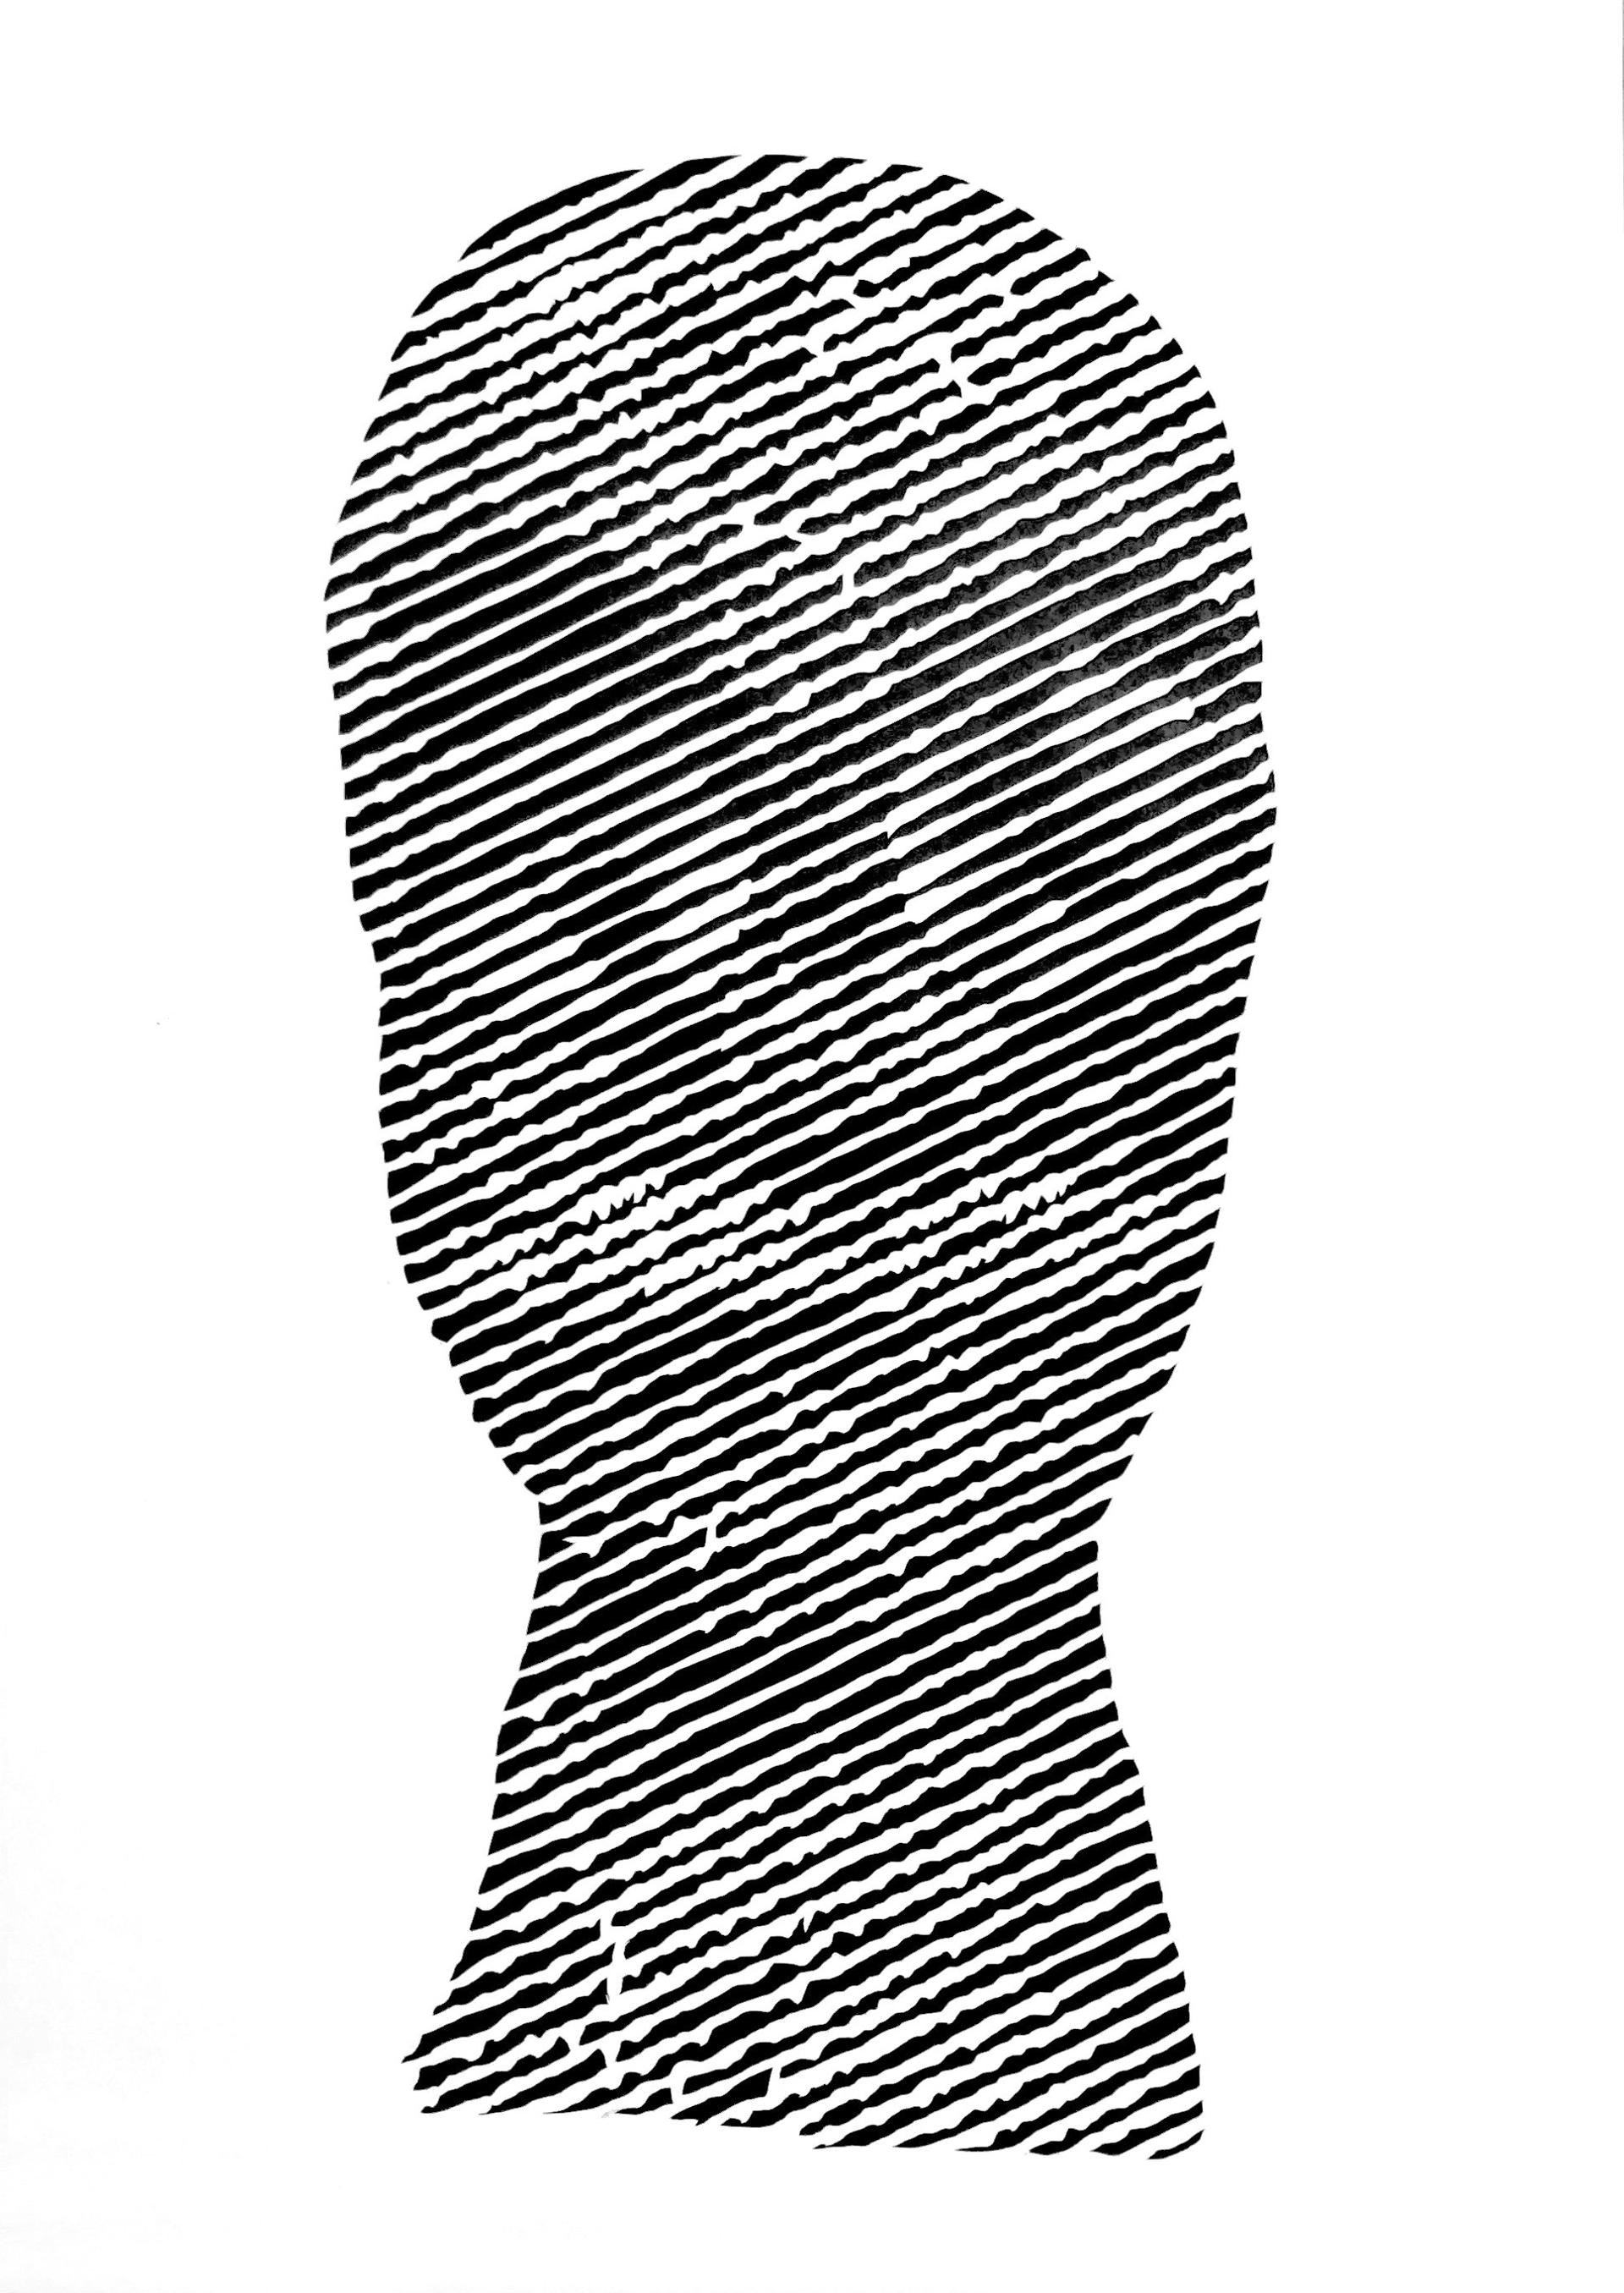 Akua Hulu Manu/Feathered God #3 by Ian Kuali'i